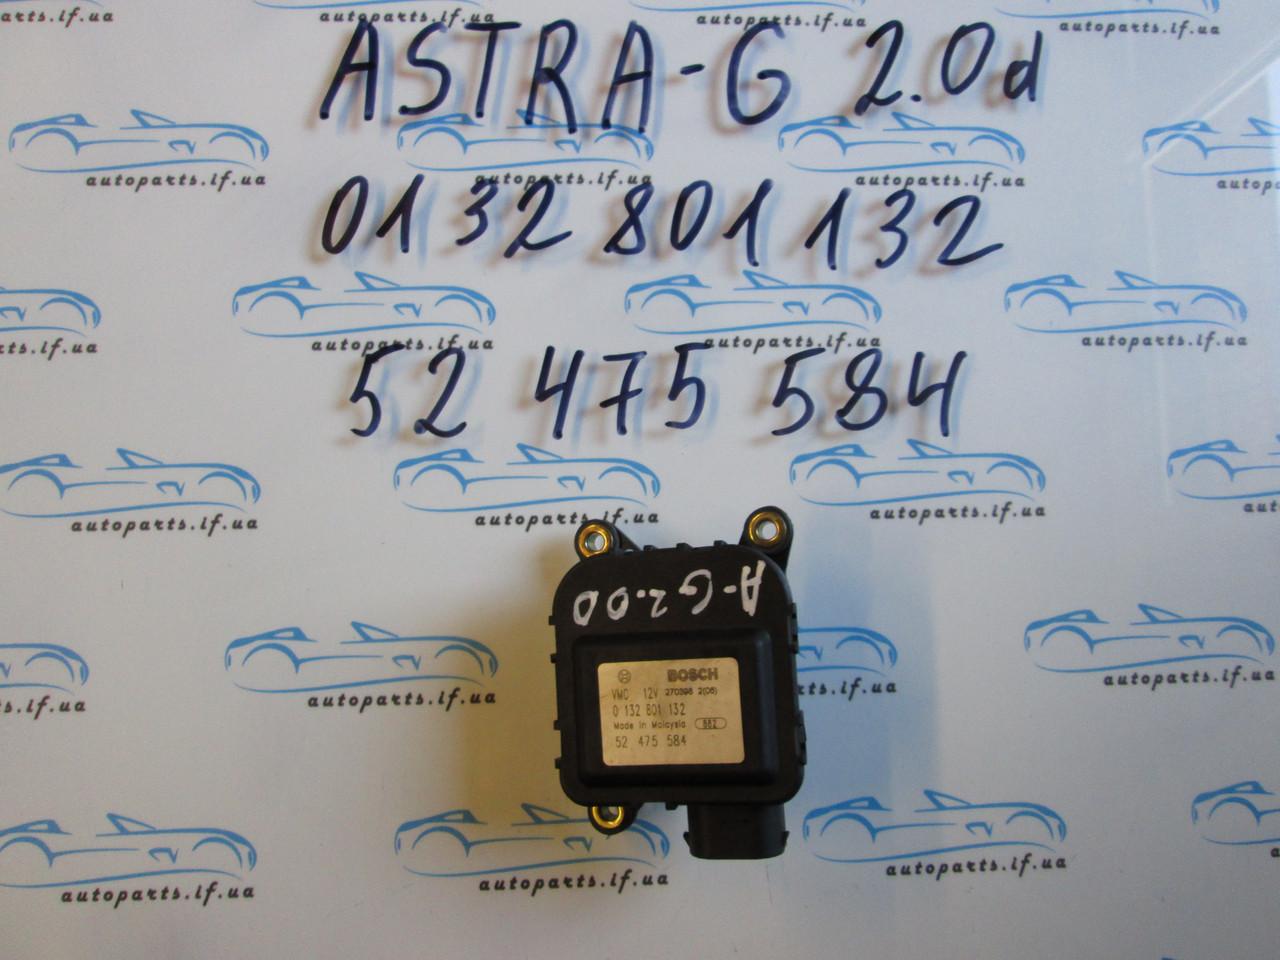 Привод заслонки печки Astra G, Астра 013280132, 52475584